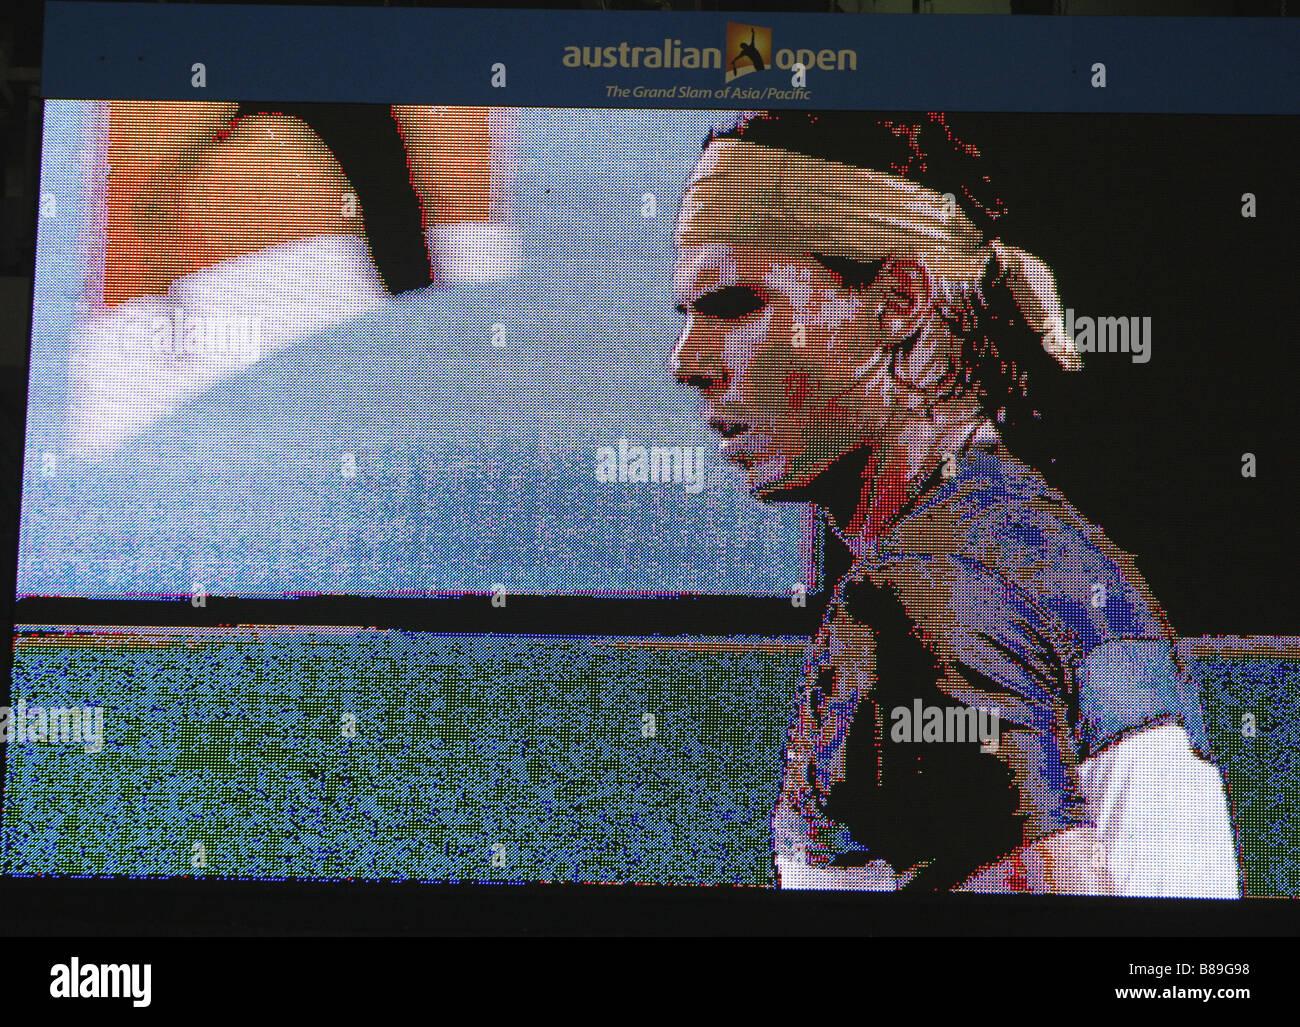 Rafael Nadal on the big stadium screen at the Australian Open 2009, Melbourne,Australia - Stock Image